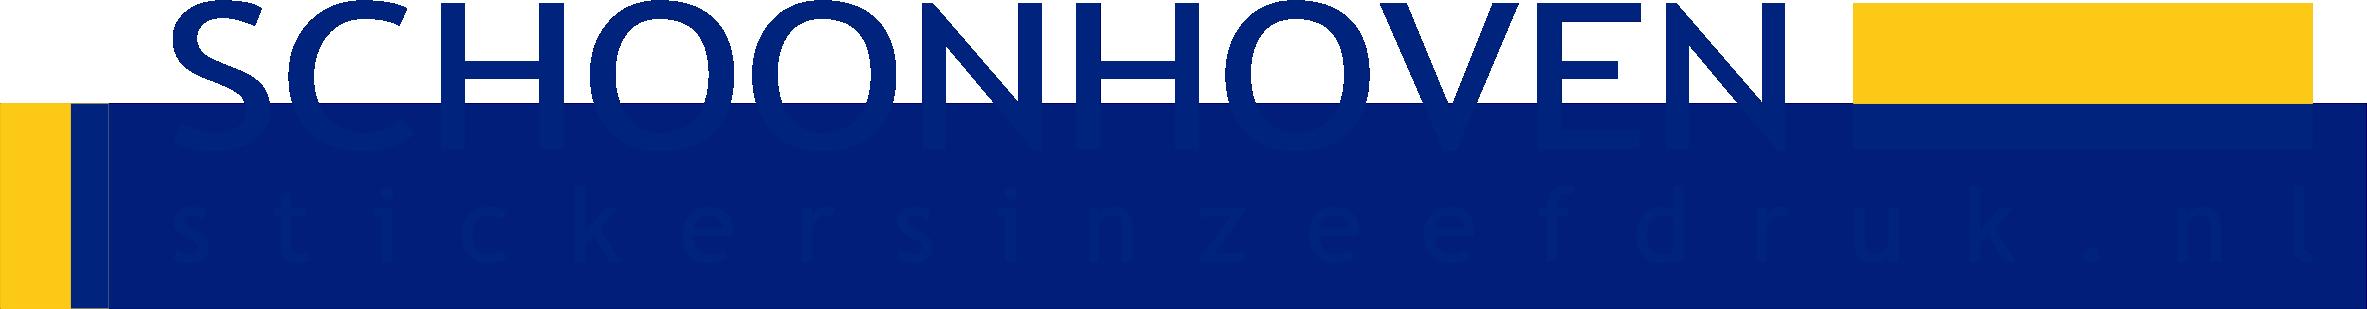 Stickers in Zeefdruk